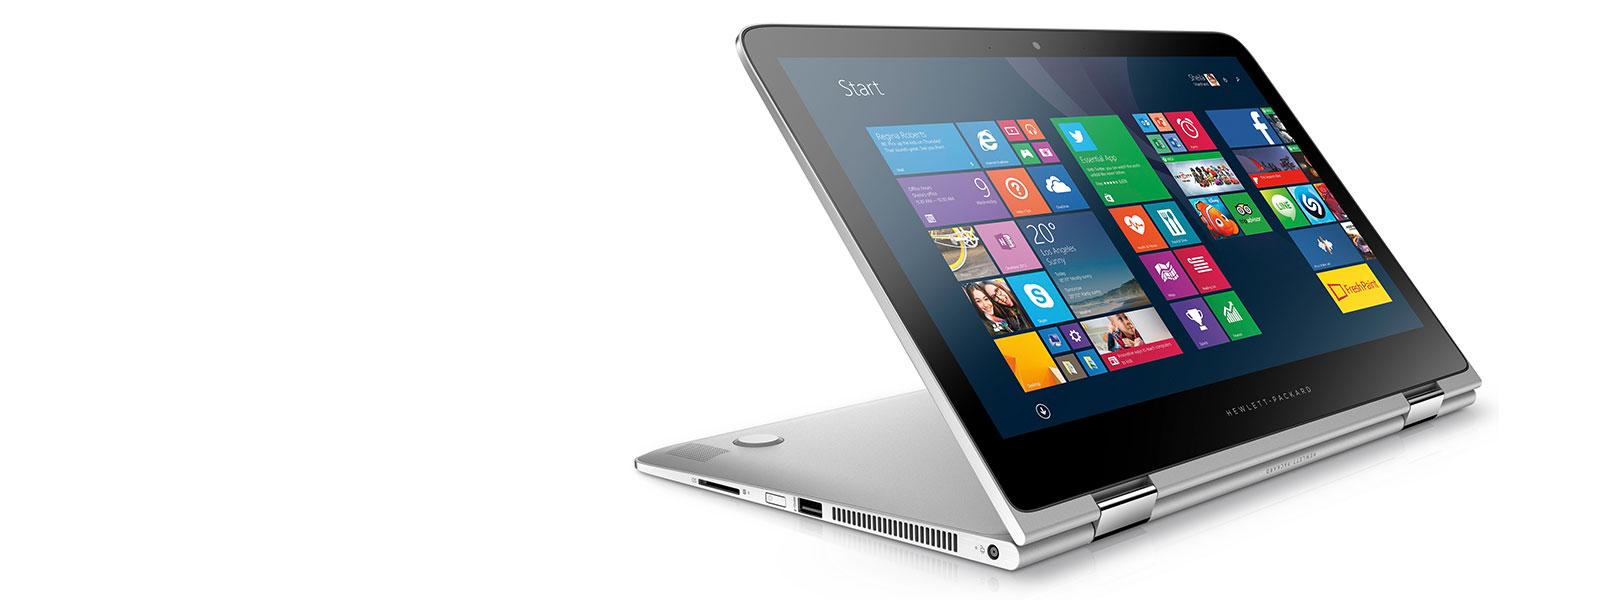 HP Spectre x360 13 with Windows 10 start screen